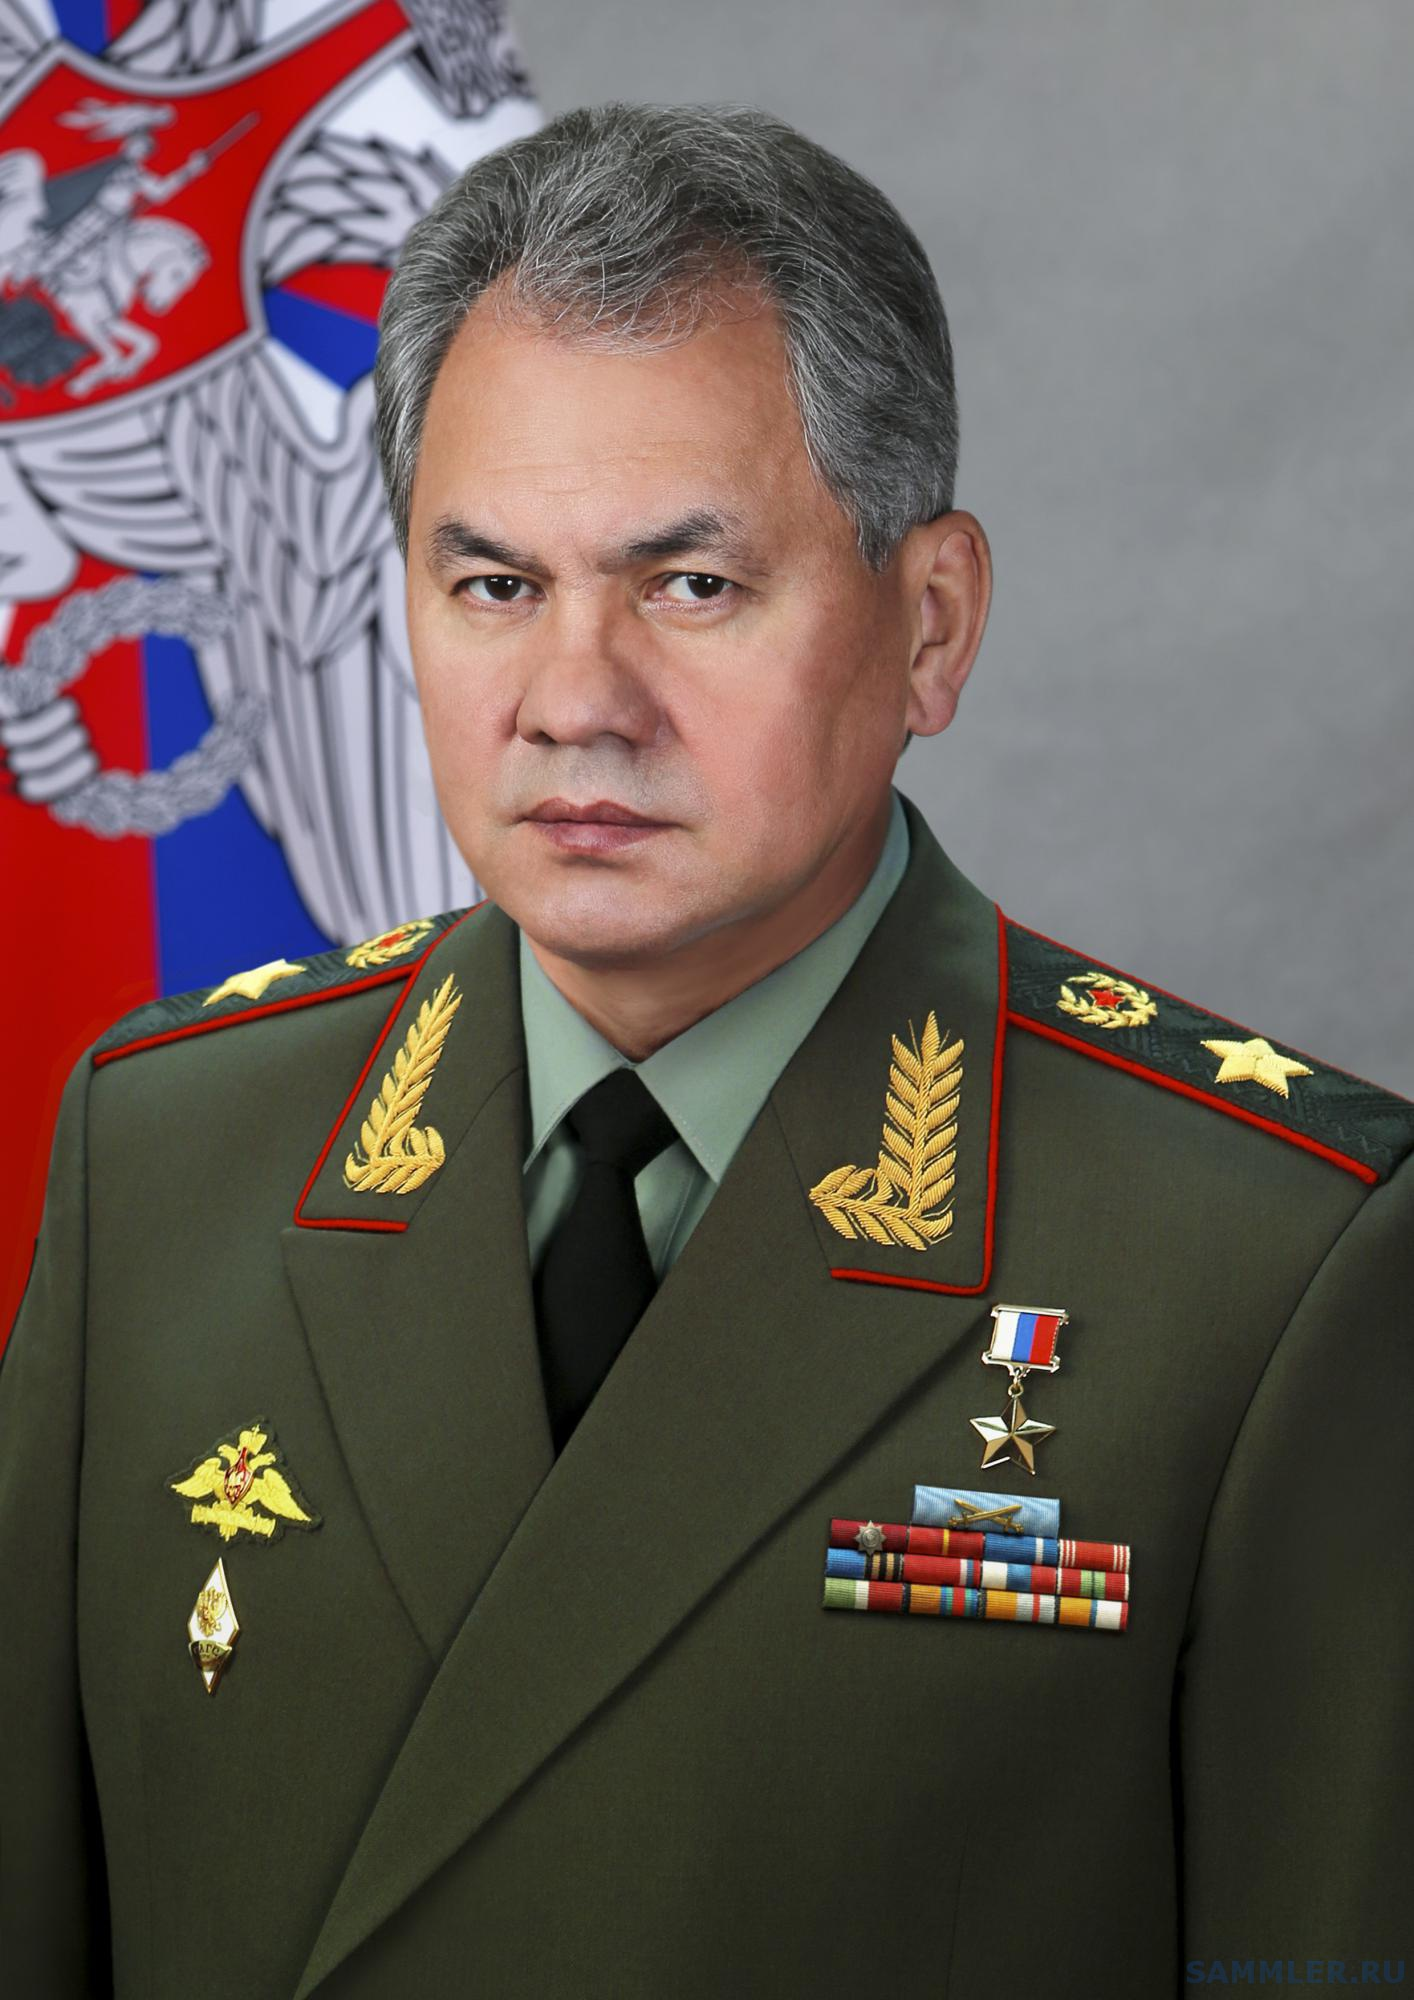 Шойгу Сергей Кожугетович - официальное фото 2015 - 2.jpg